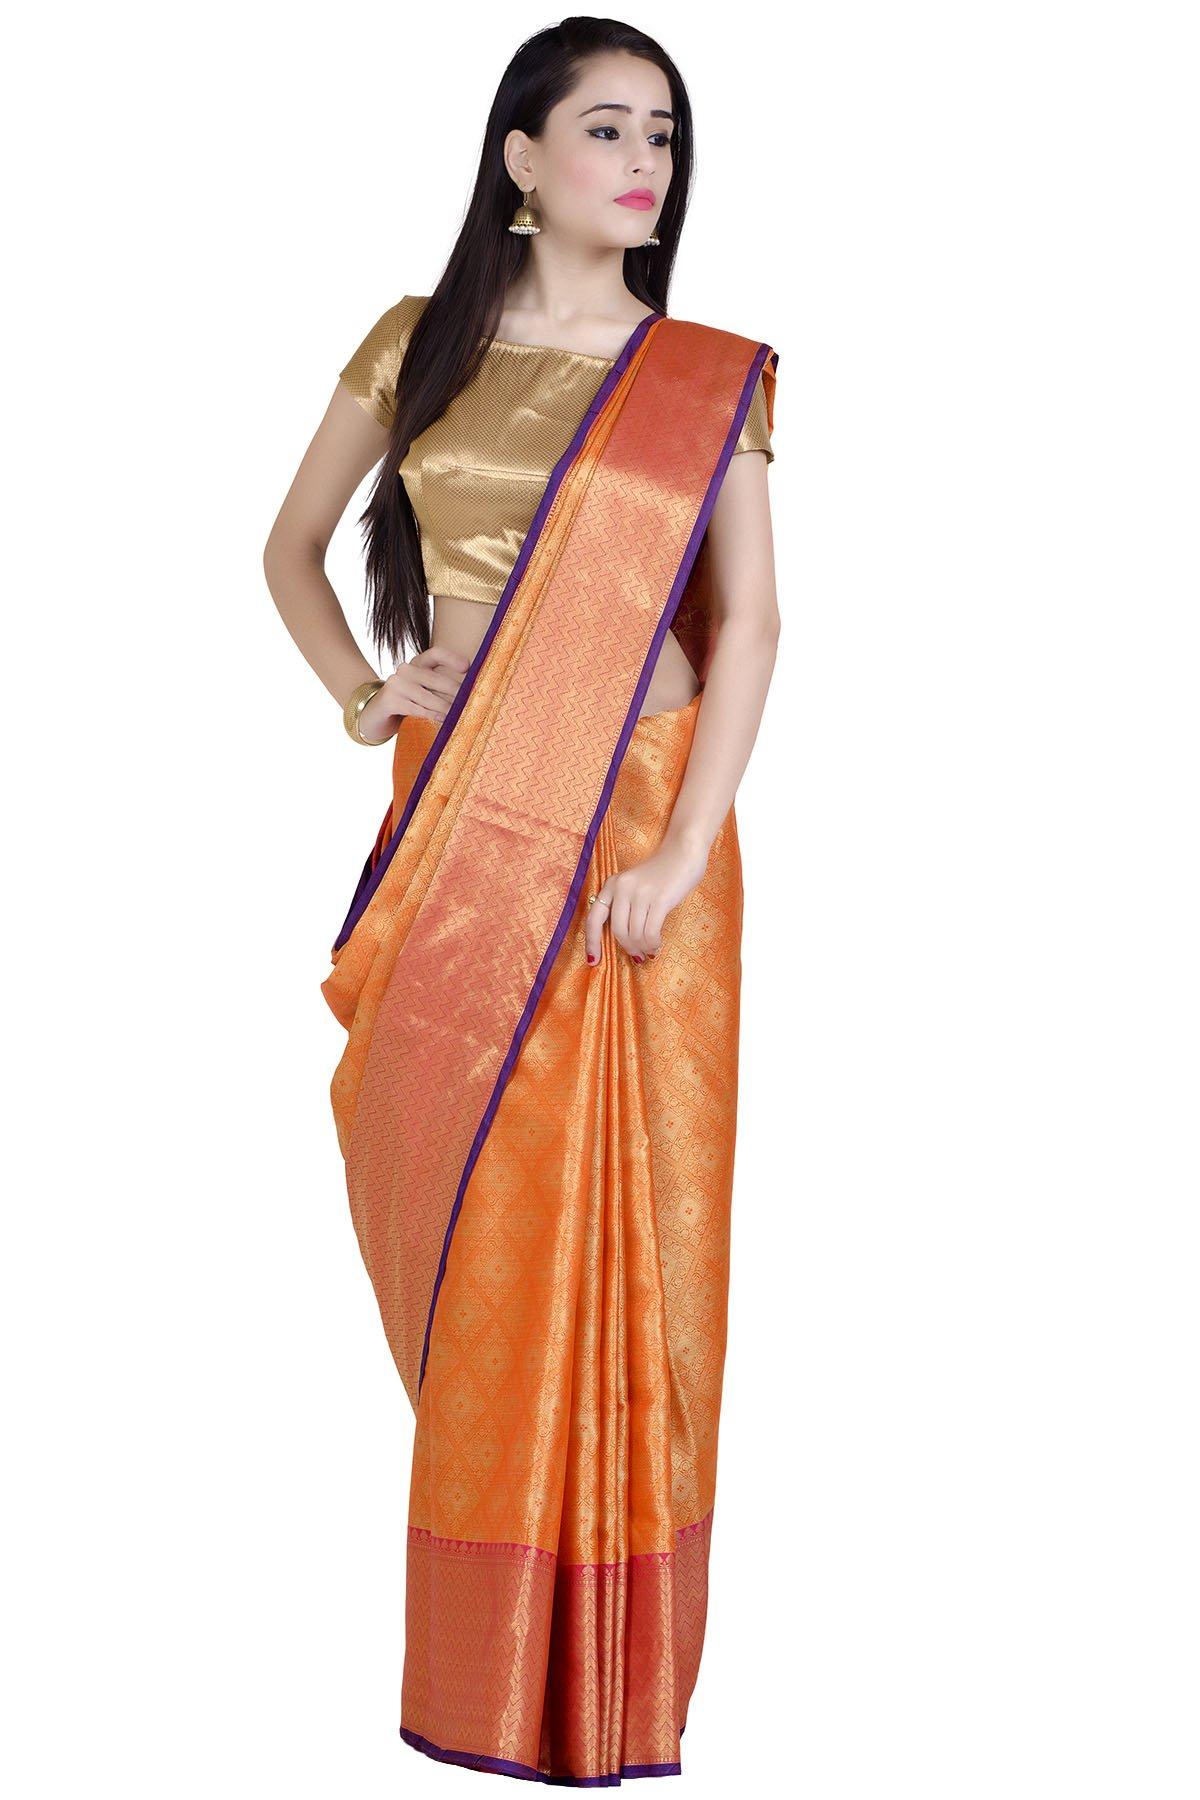 Chandrakala Women's Banarasi Cotton Silk Saree (Orange-1)